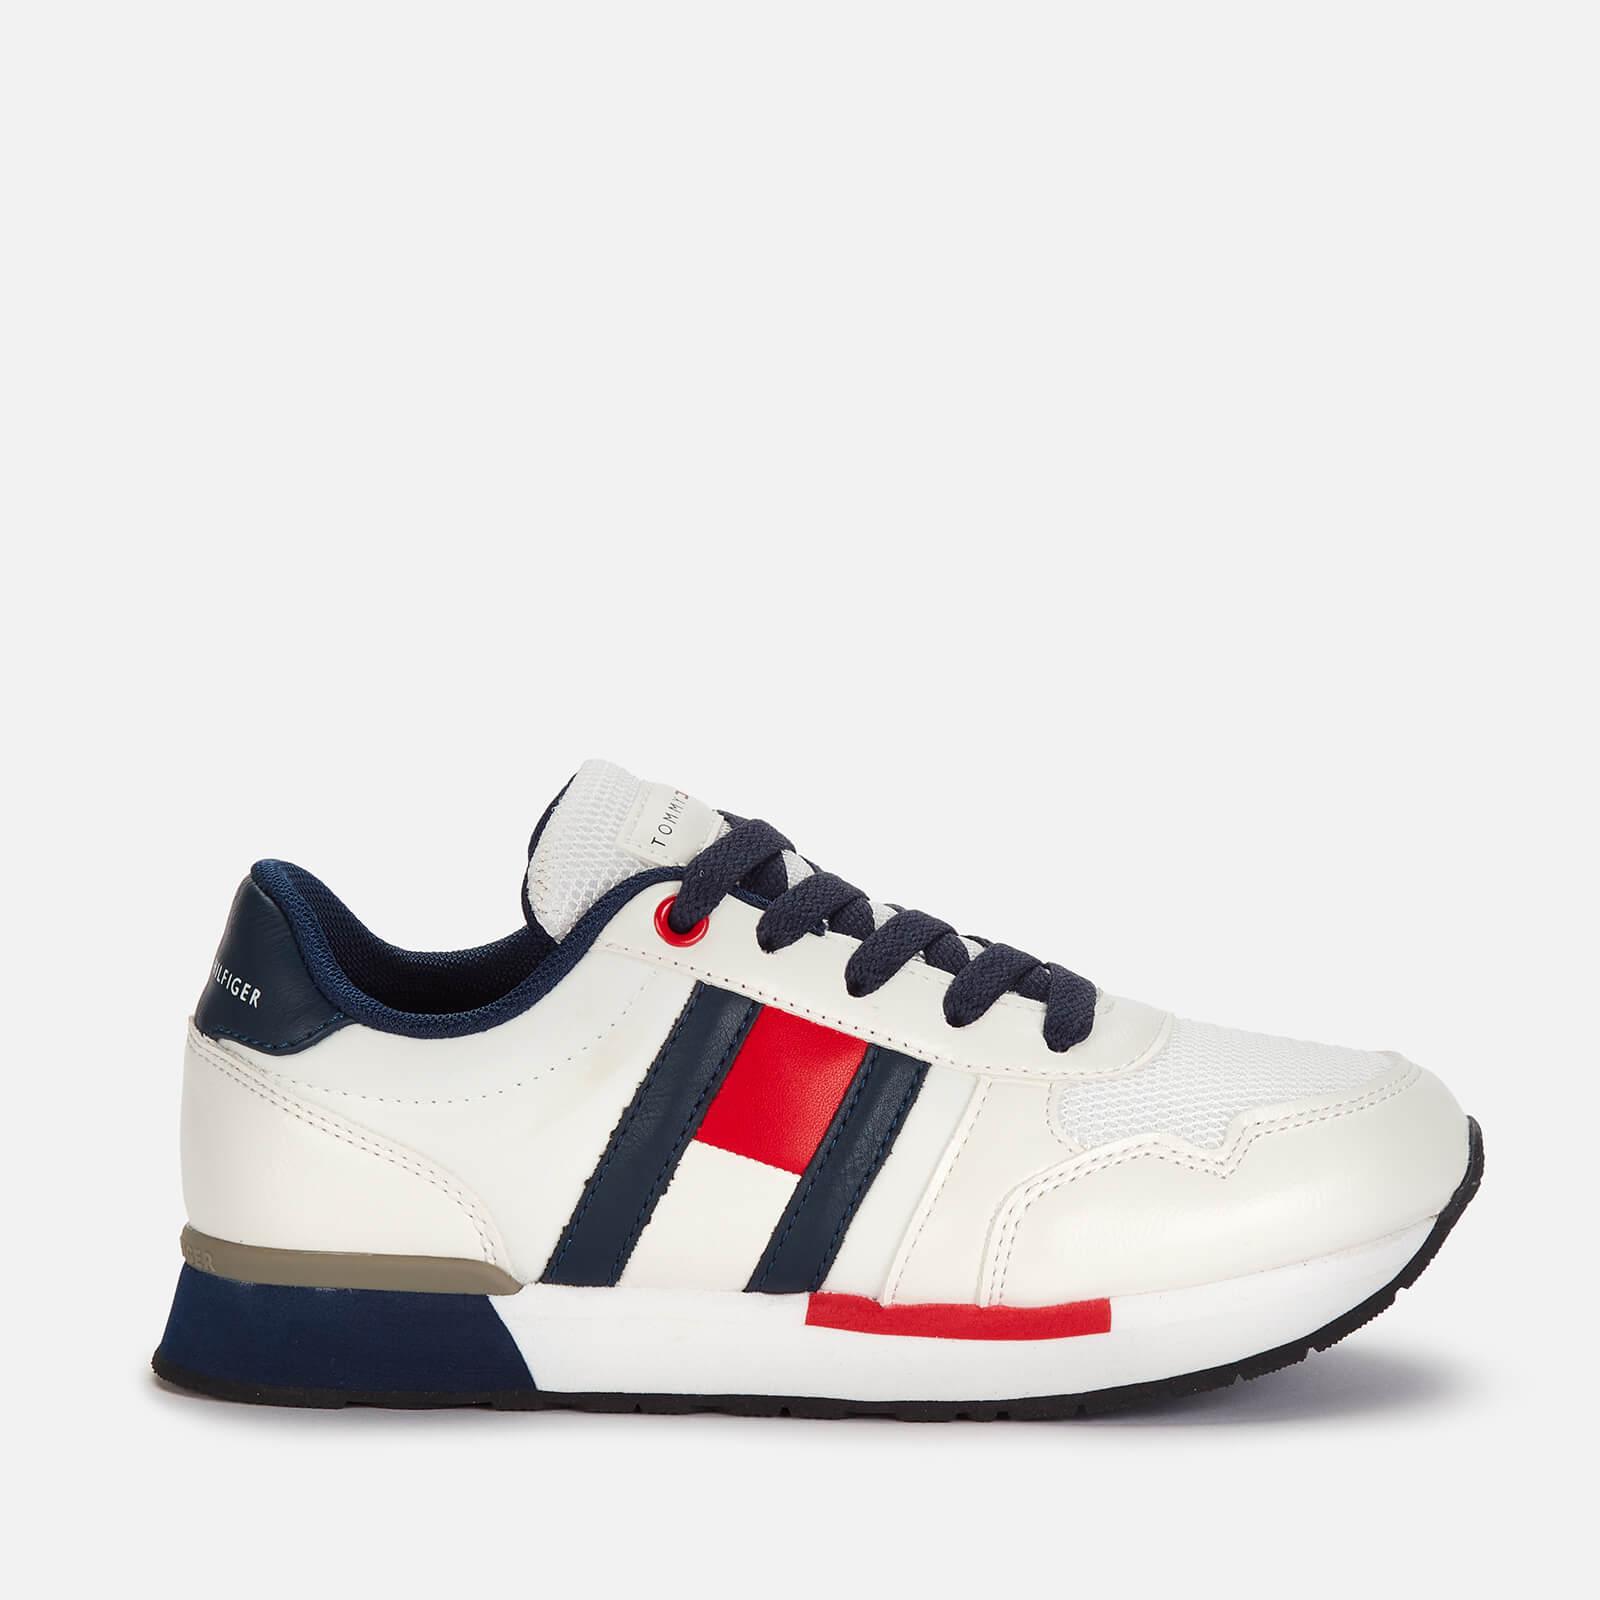 Tommy Hilfiger Boys' Low Cut Lace-Up Sneaker - White/B White/Blue - UK 12 Kids